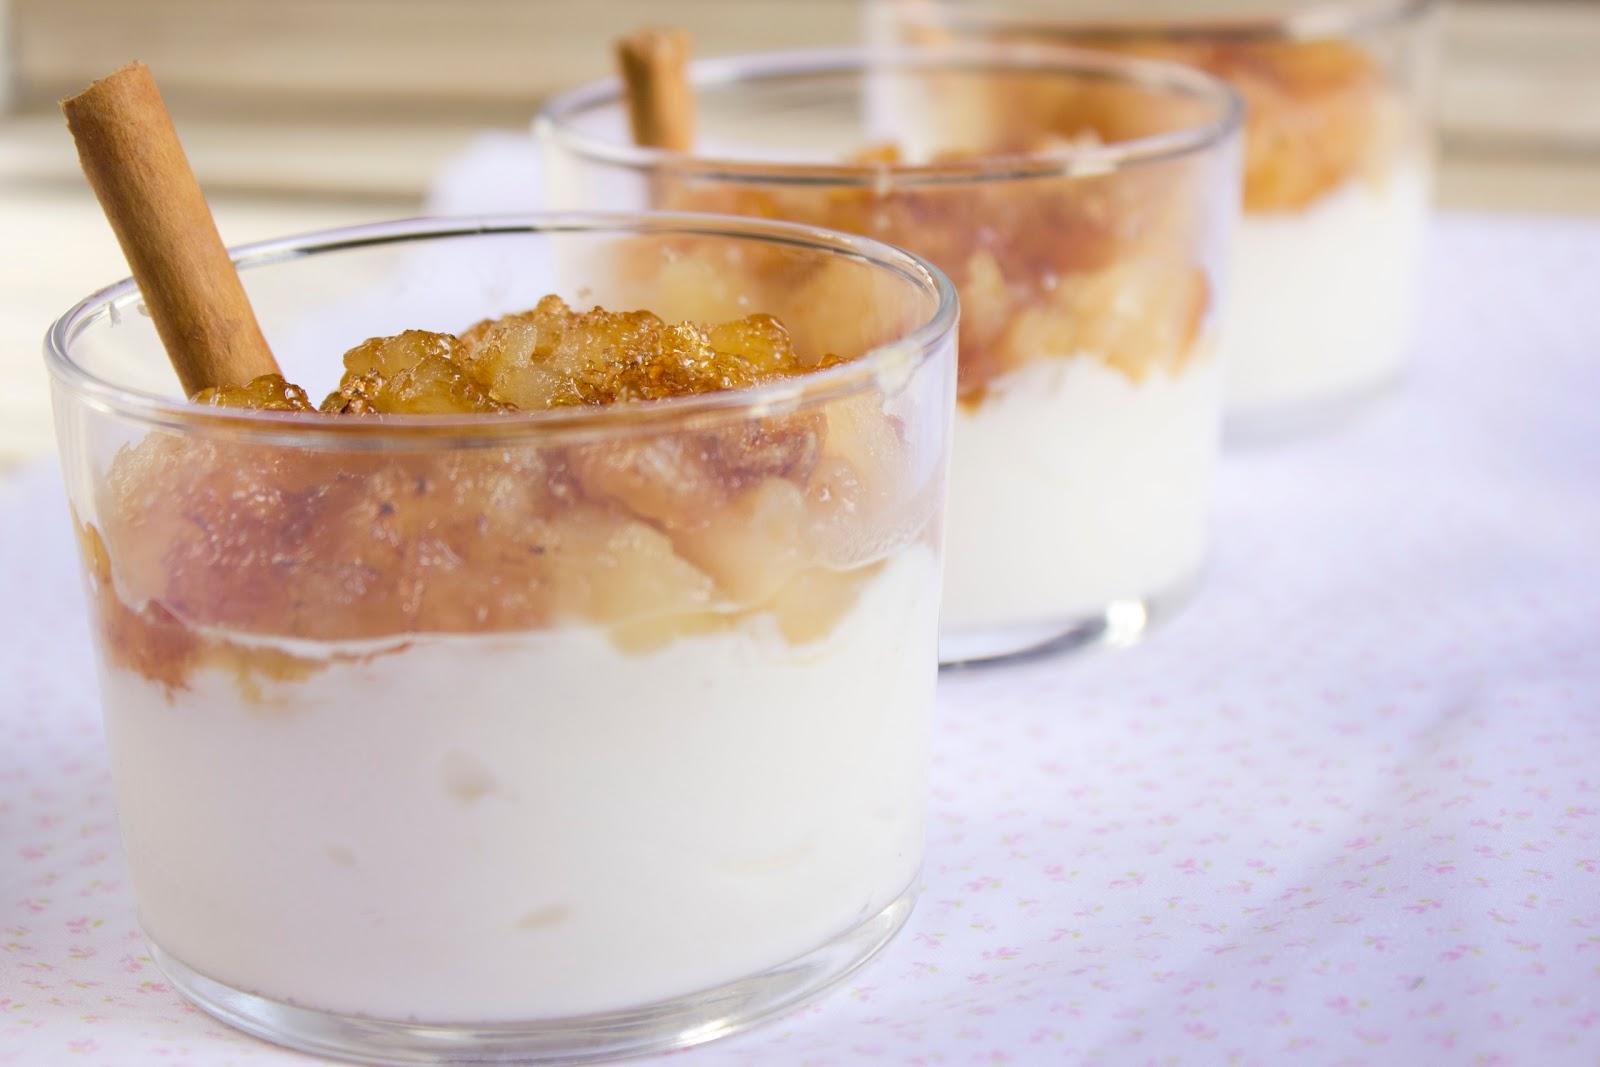 Vasitos de manzana caramelizada con crema de queso